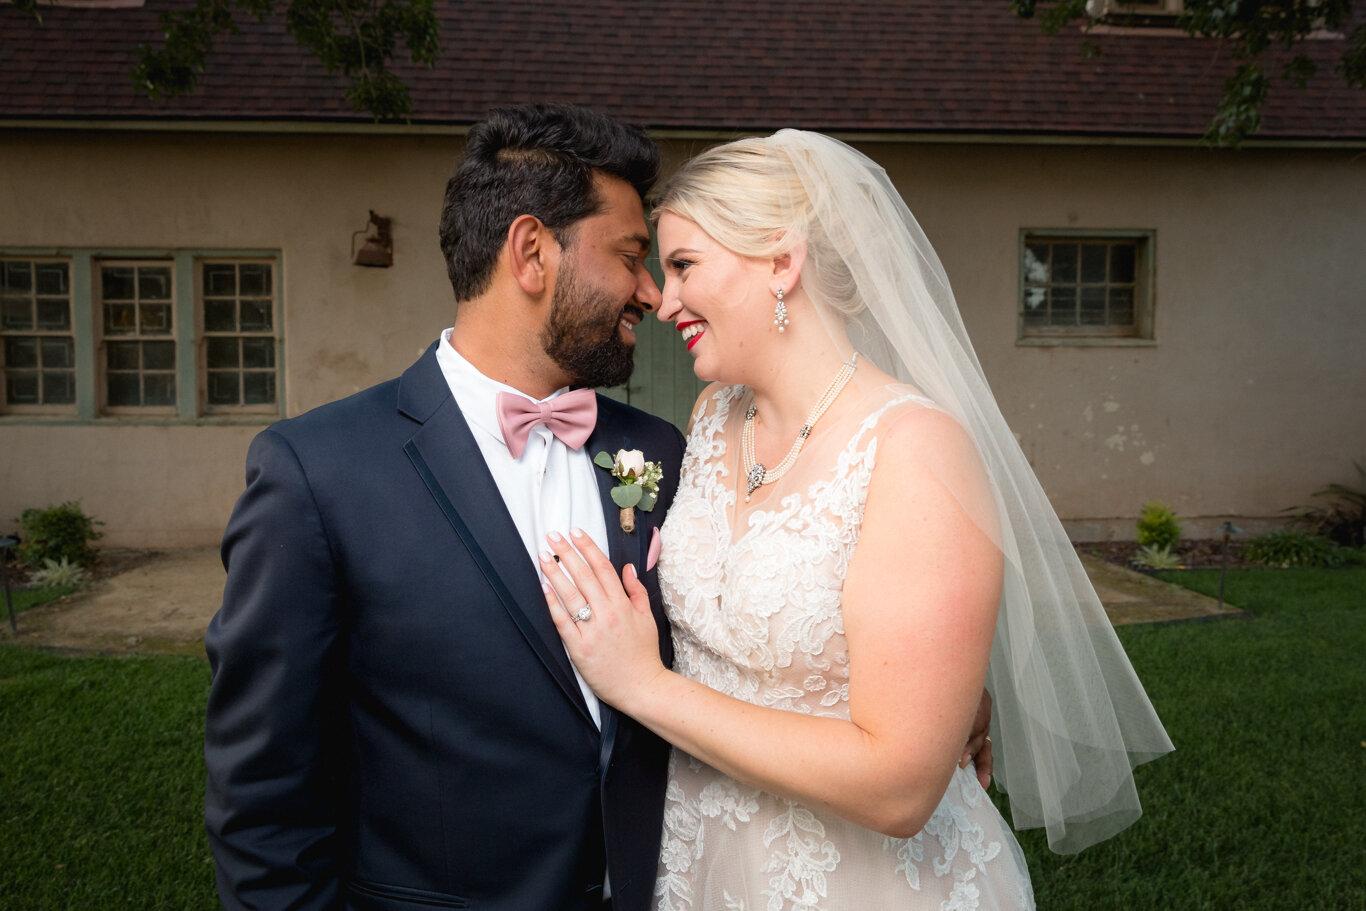 2019.08.24_Emily-Ashir-Wedding-at-the-Maples-6259.jpg